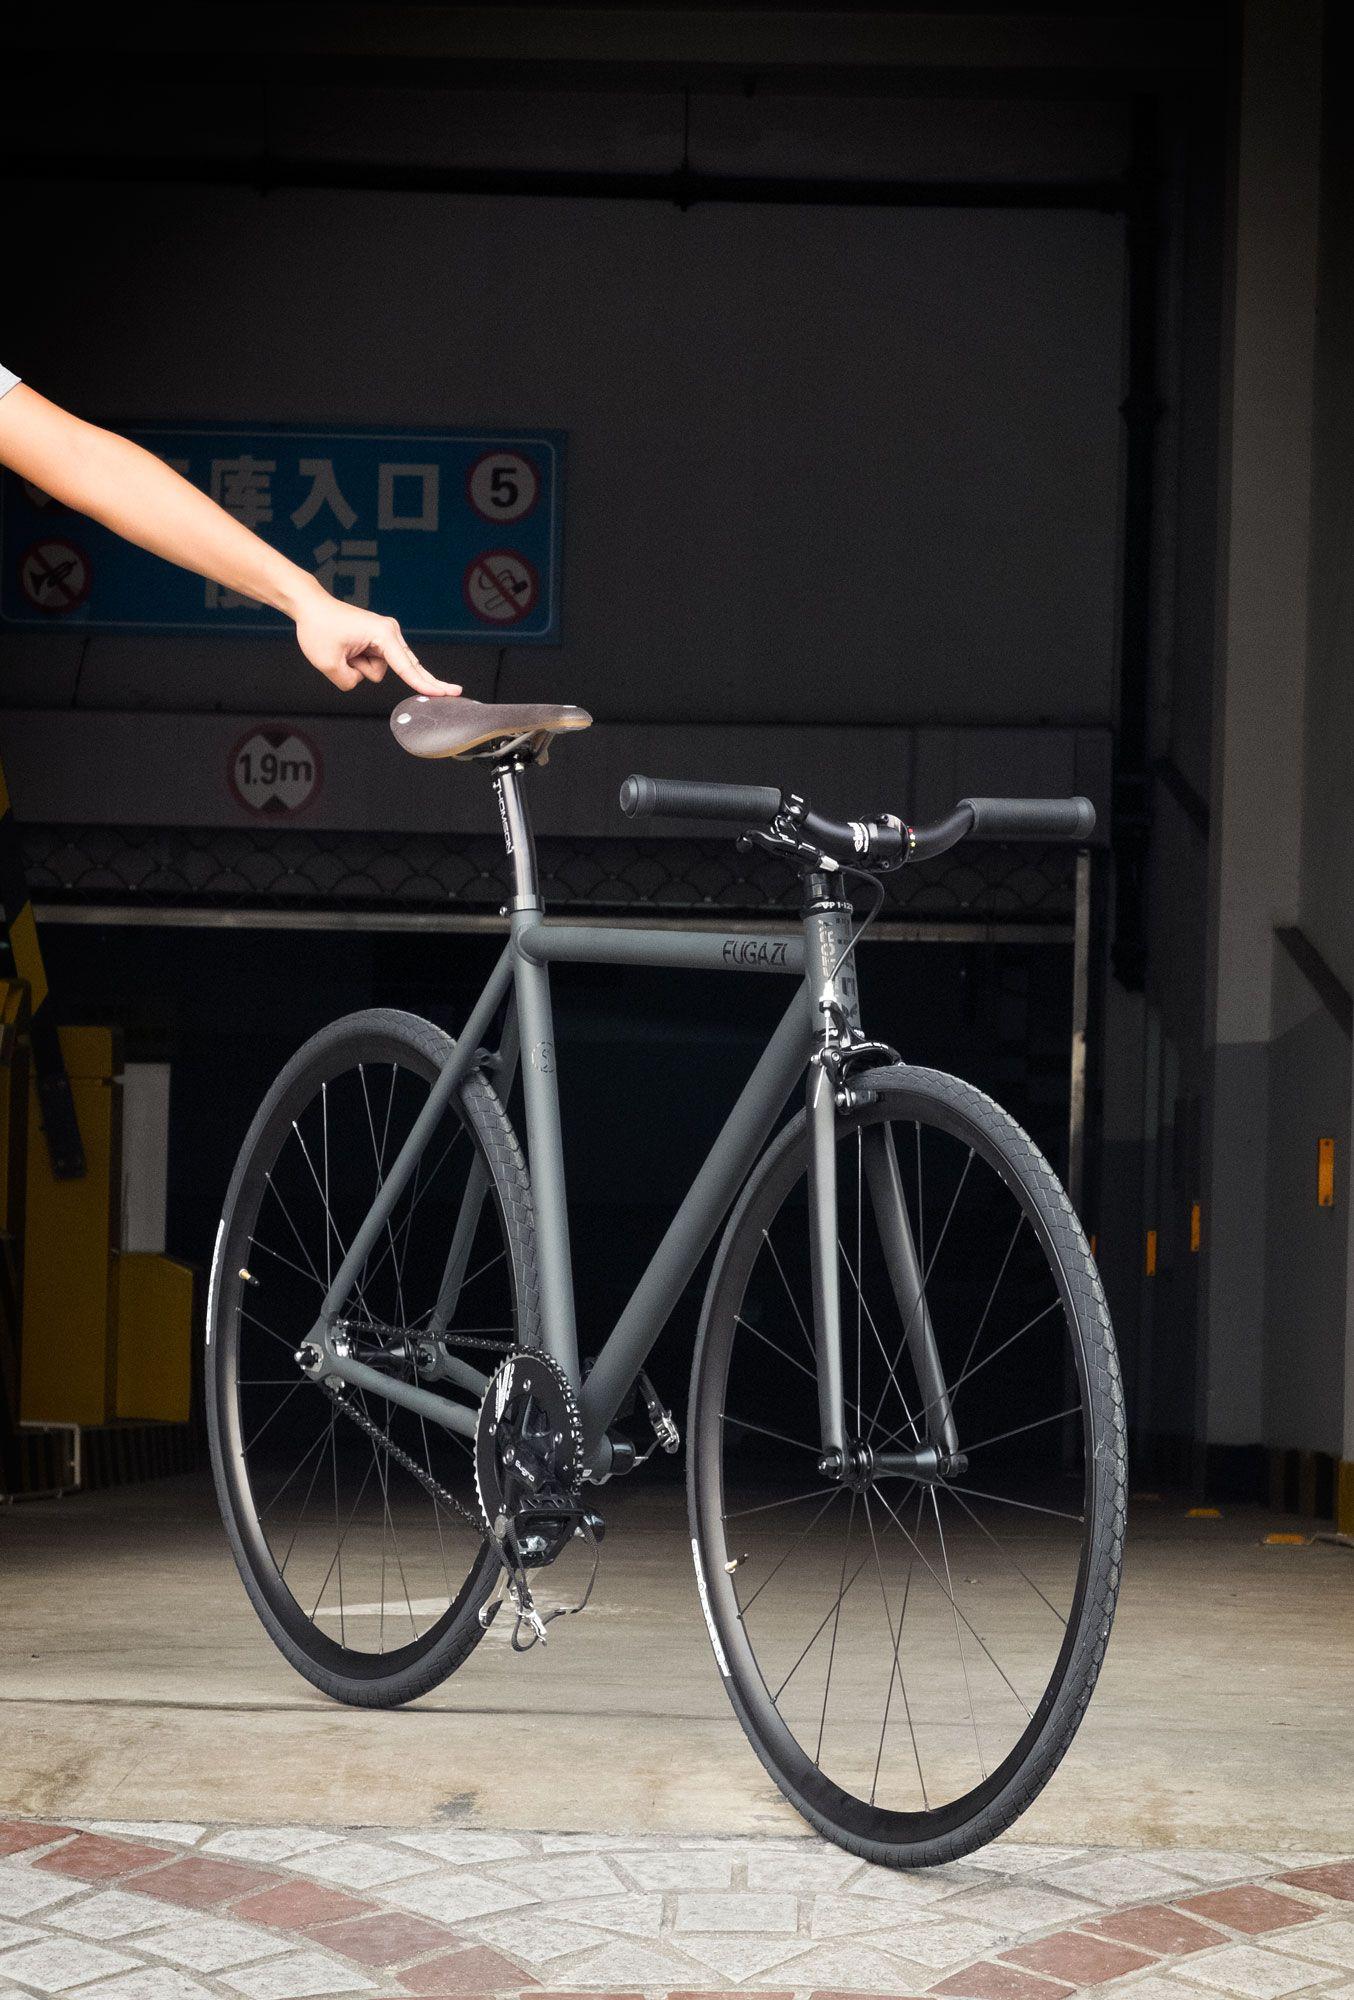 a2c2b0d68a5  factoryfive  factory5  F550  custom  matte  grey  trackbike  bicycle   shanghai  china  webuildweride  fixedgear  fixie